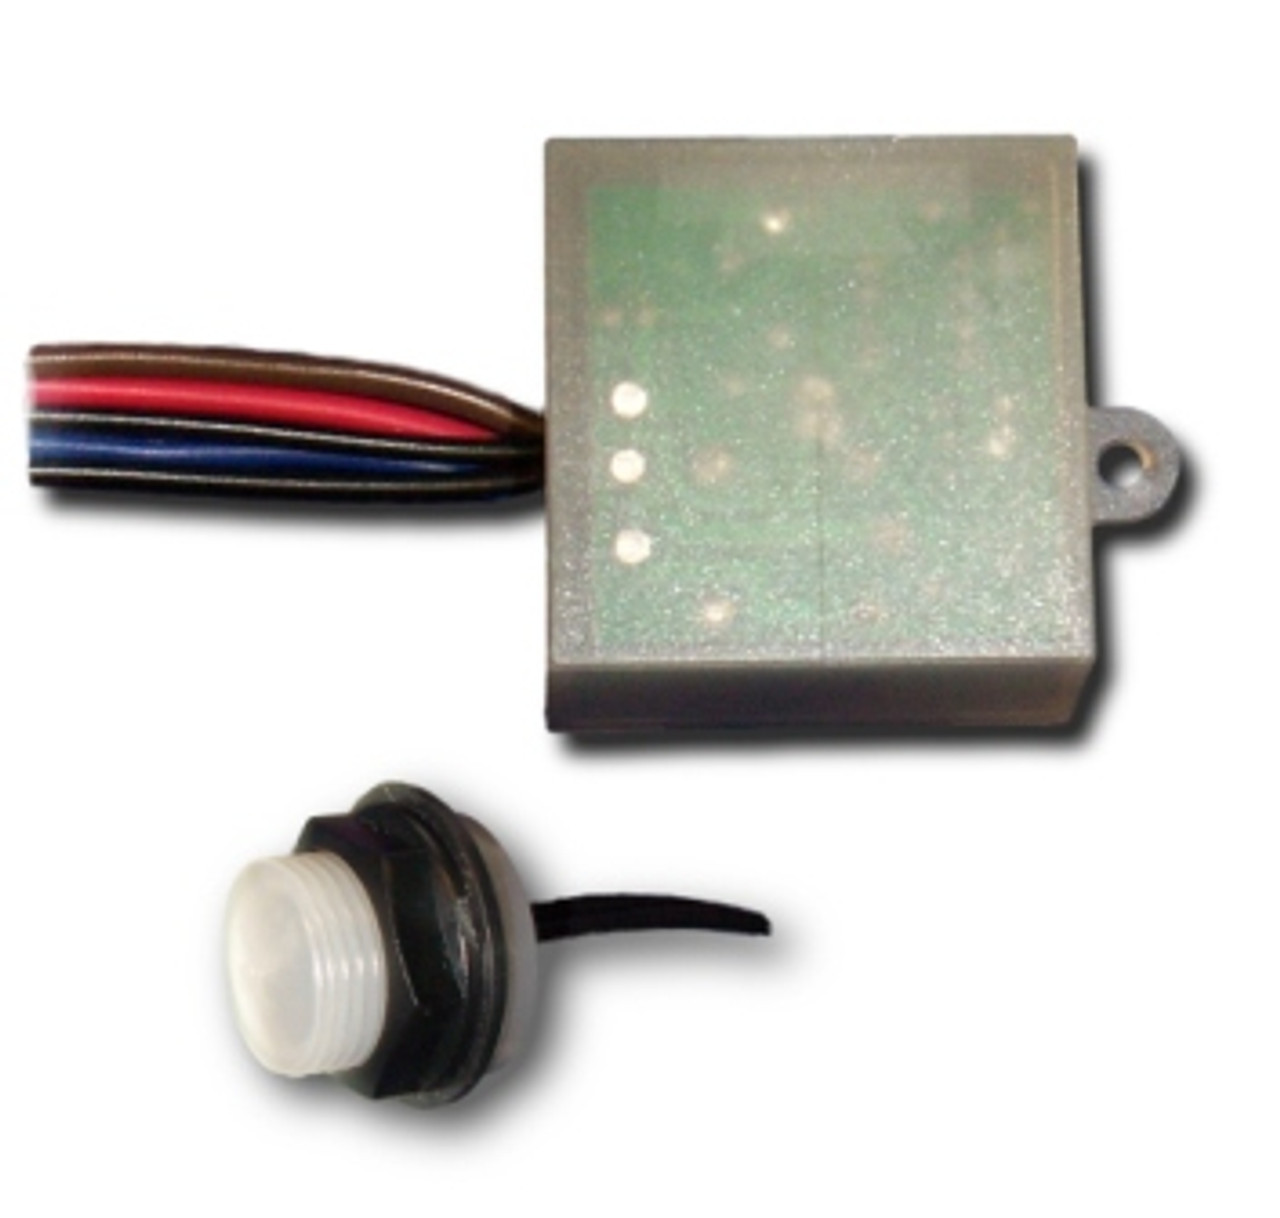 12V remote sensor photocell switch for LED lights 12V DC